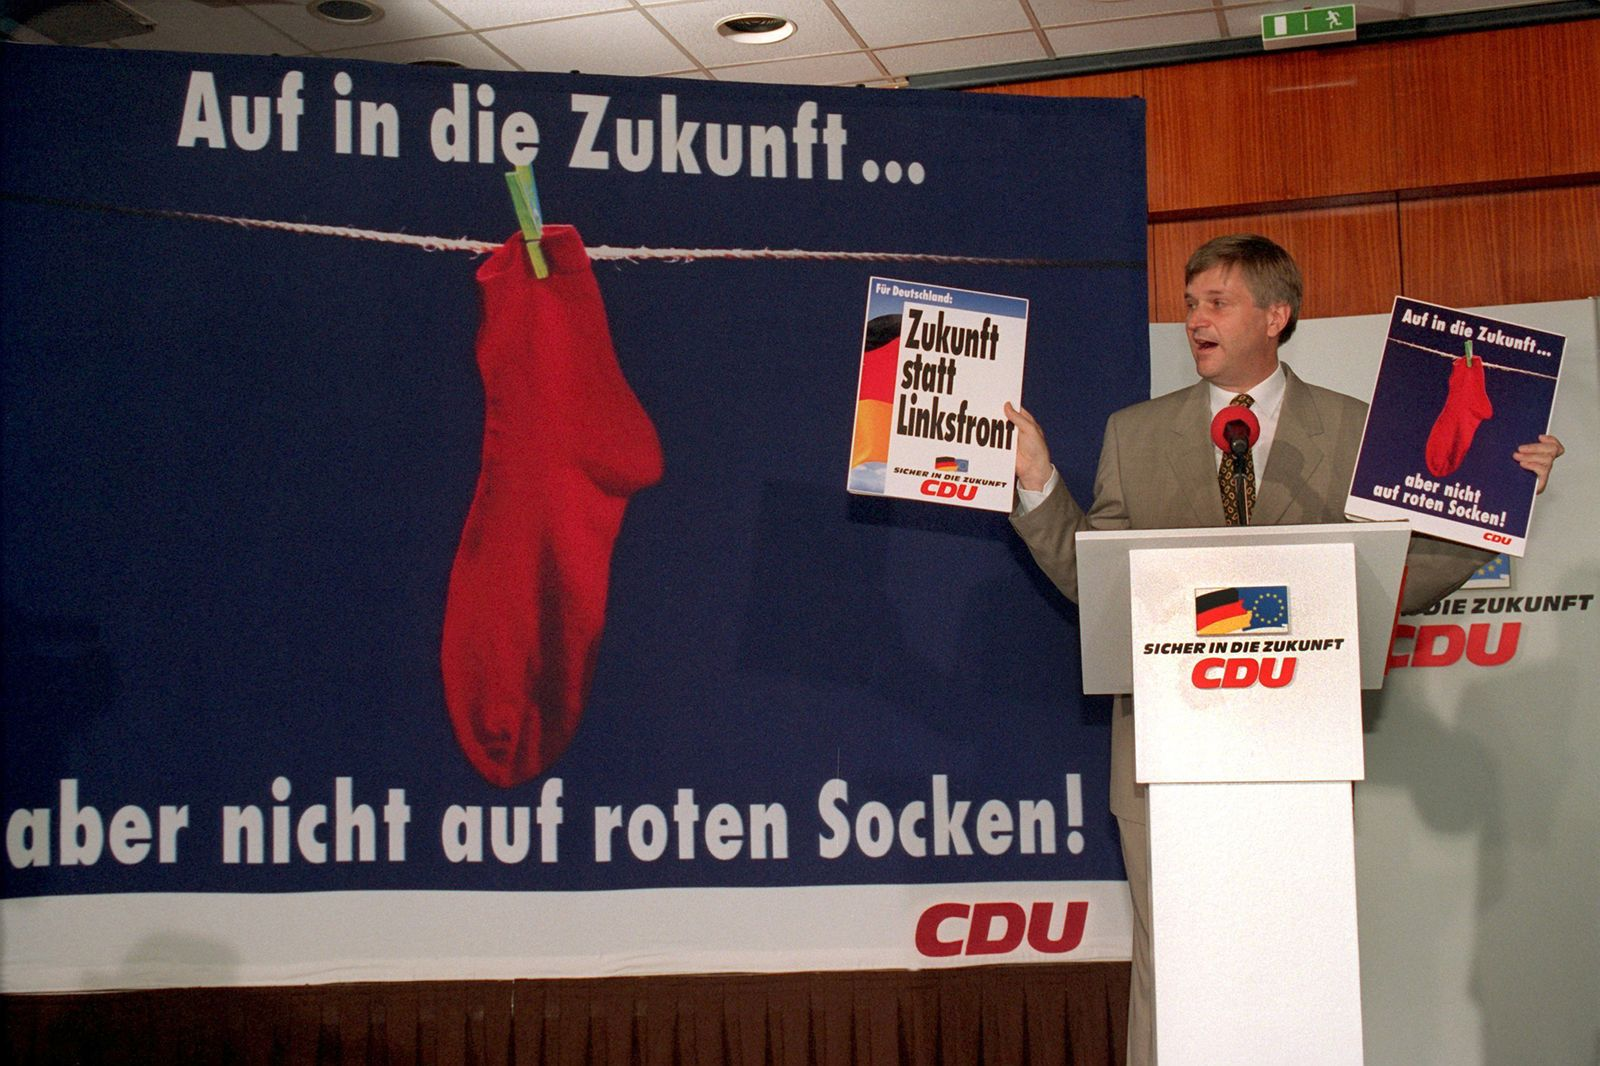 Rote Socken / CDU